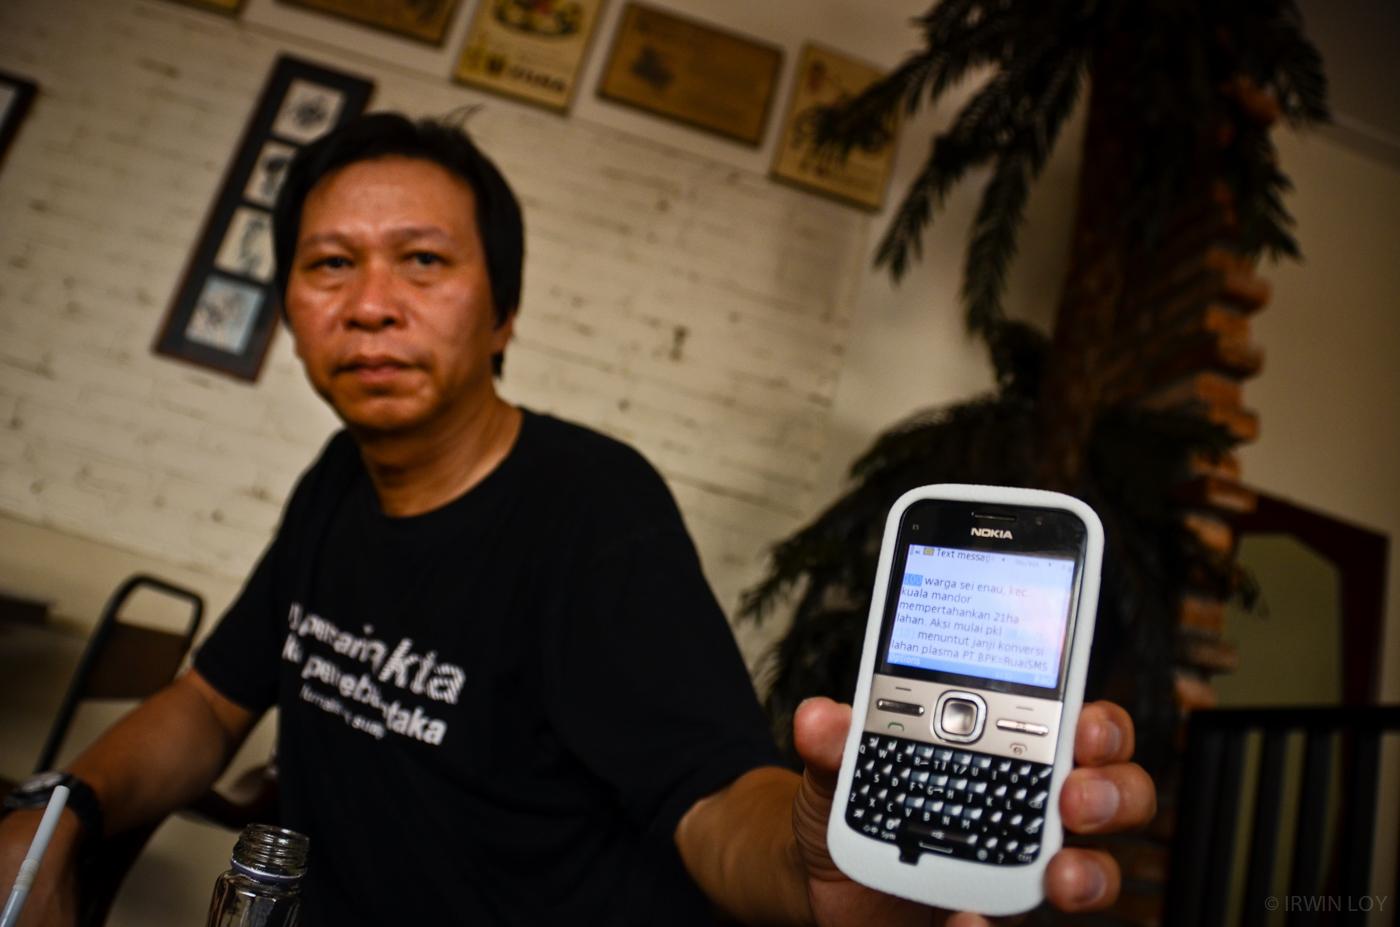 Journalist Harry Surjadi began the SMS news program in 2010, training 200 villagers from around West Kalimantan as citizen journalists.